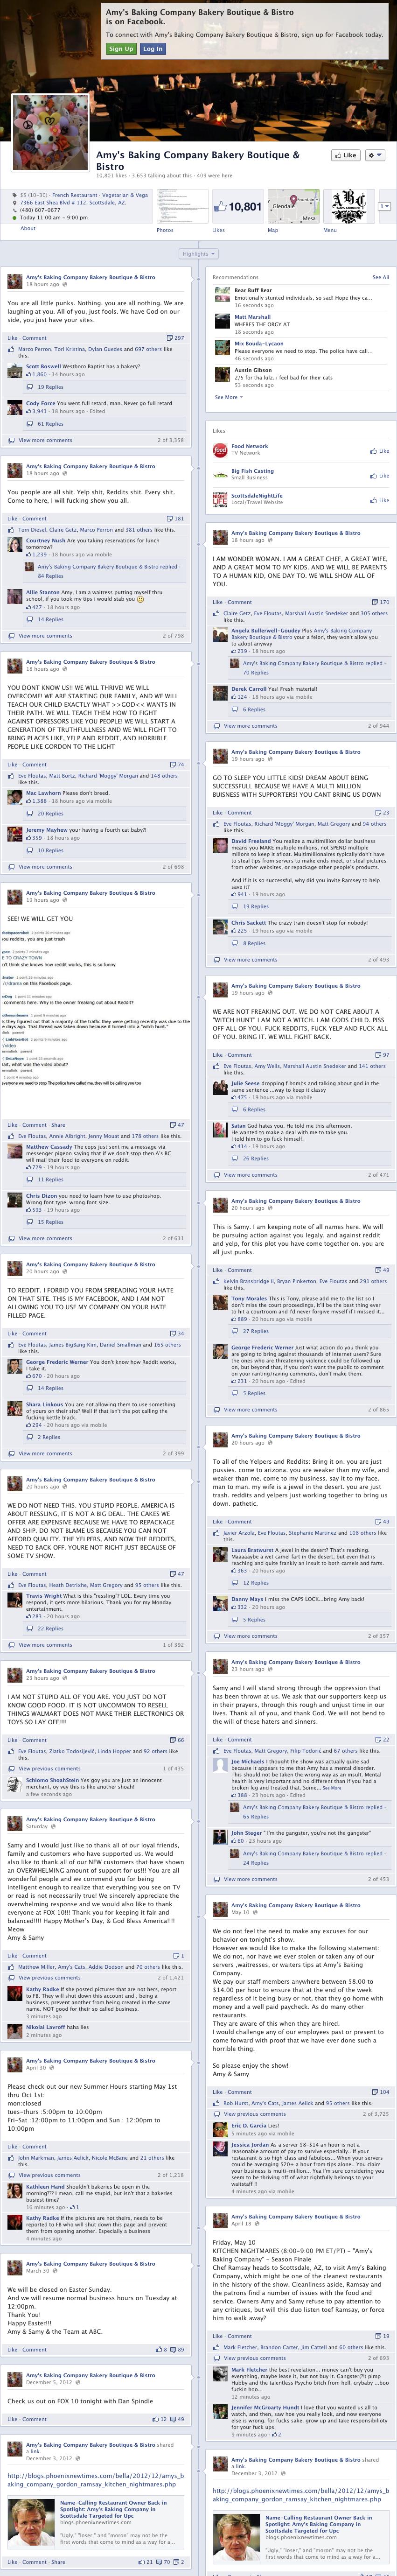 Facebook Case Study Amys Baking Company